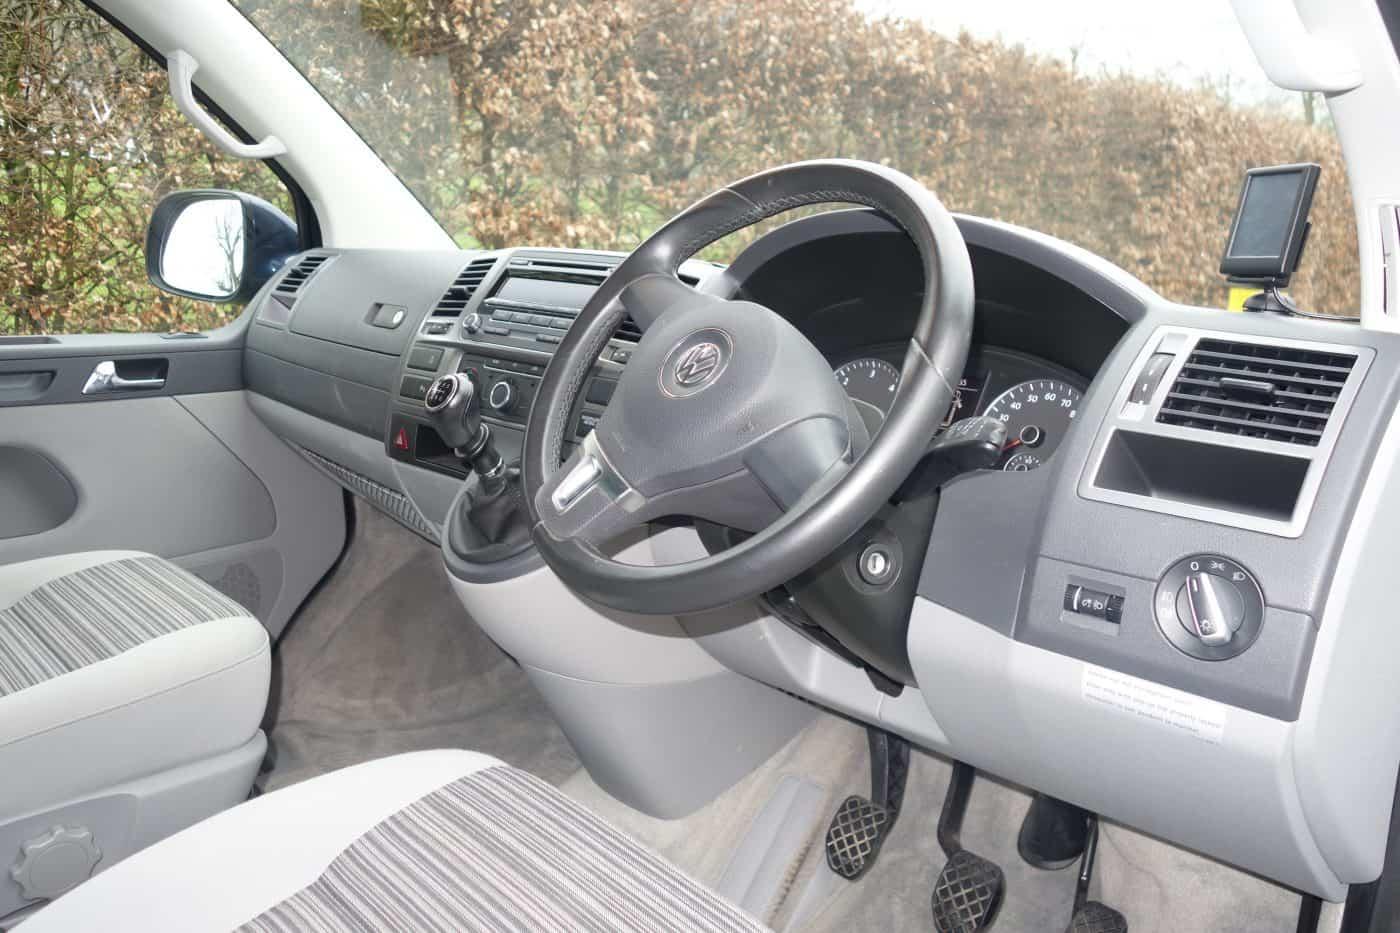 Karen's Kottages VW California camper van hire Northumberland - driver's seat and steering wheel